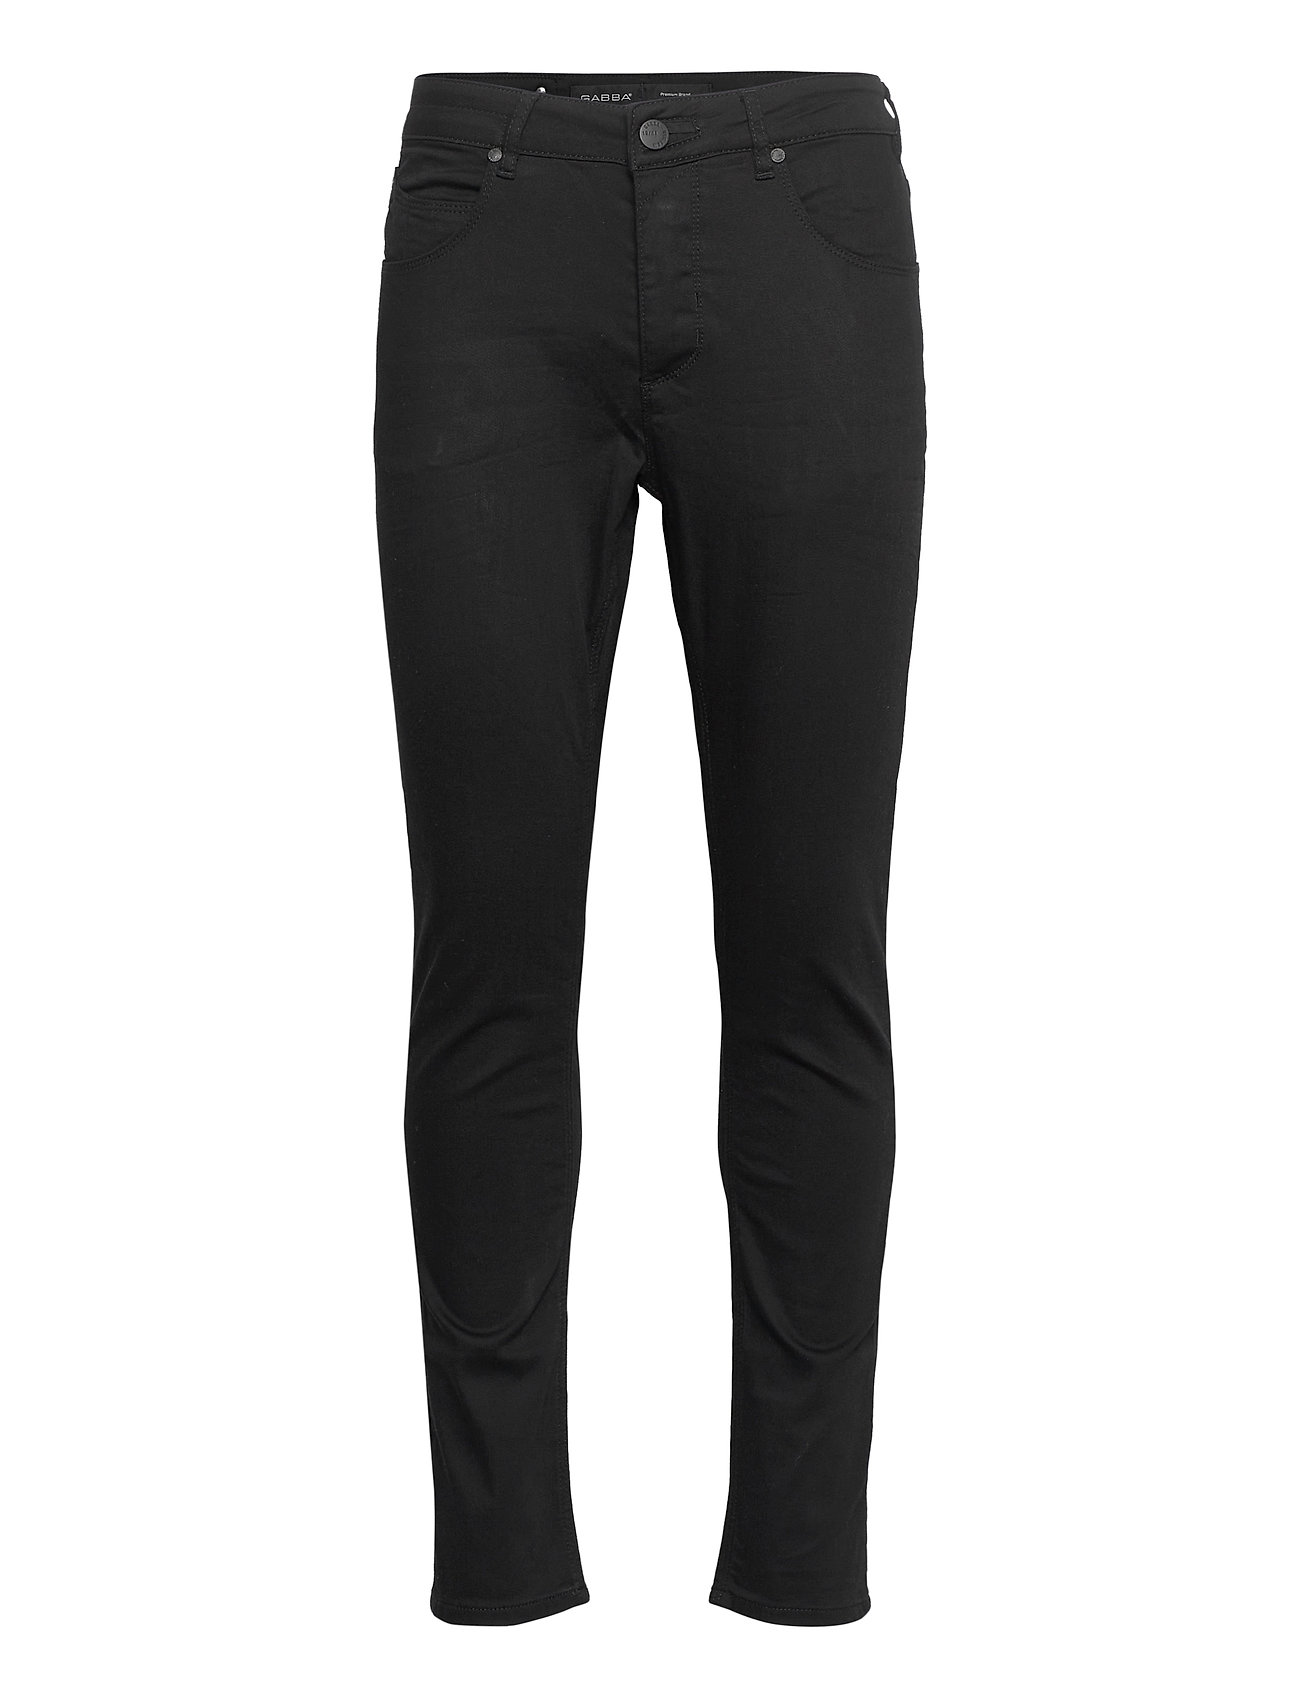 Image of Rey K1535 Black Night Jeans Slim Jeans Sort Gabba (3462446899)